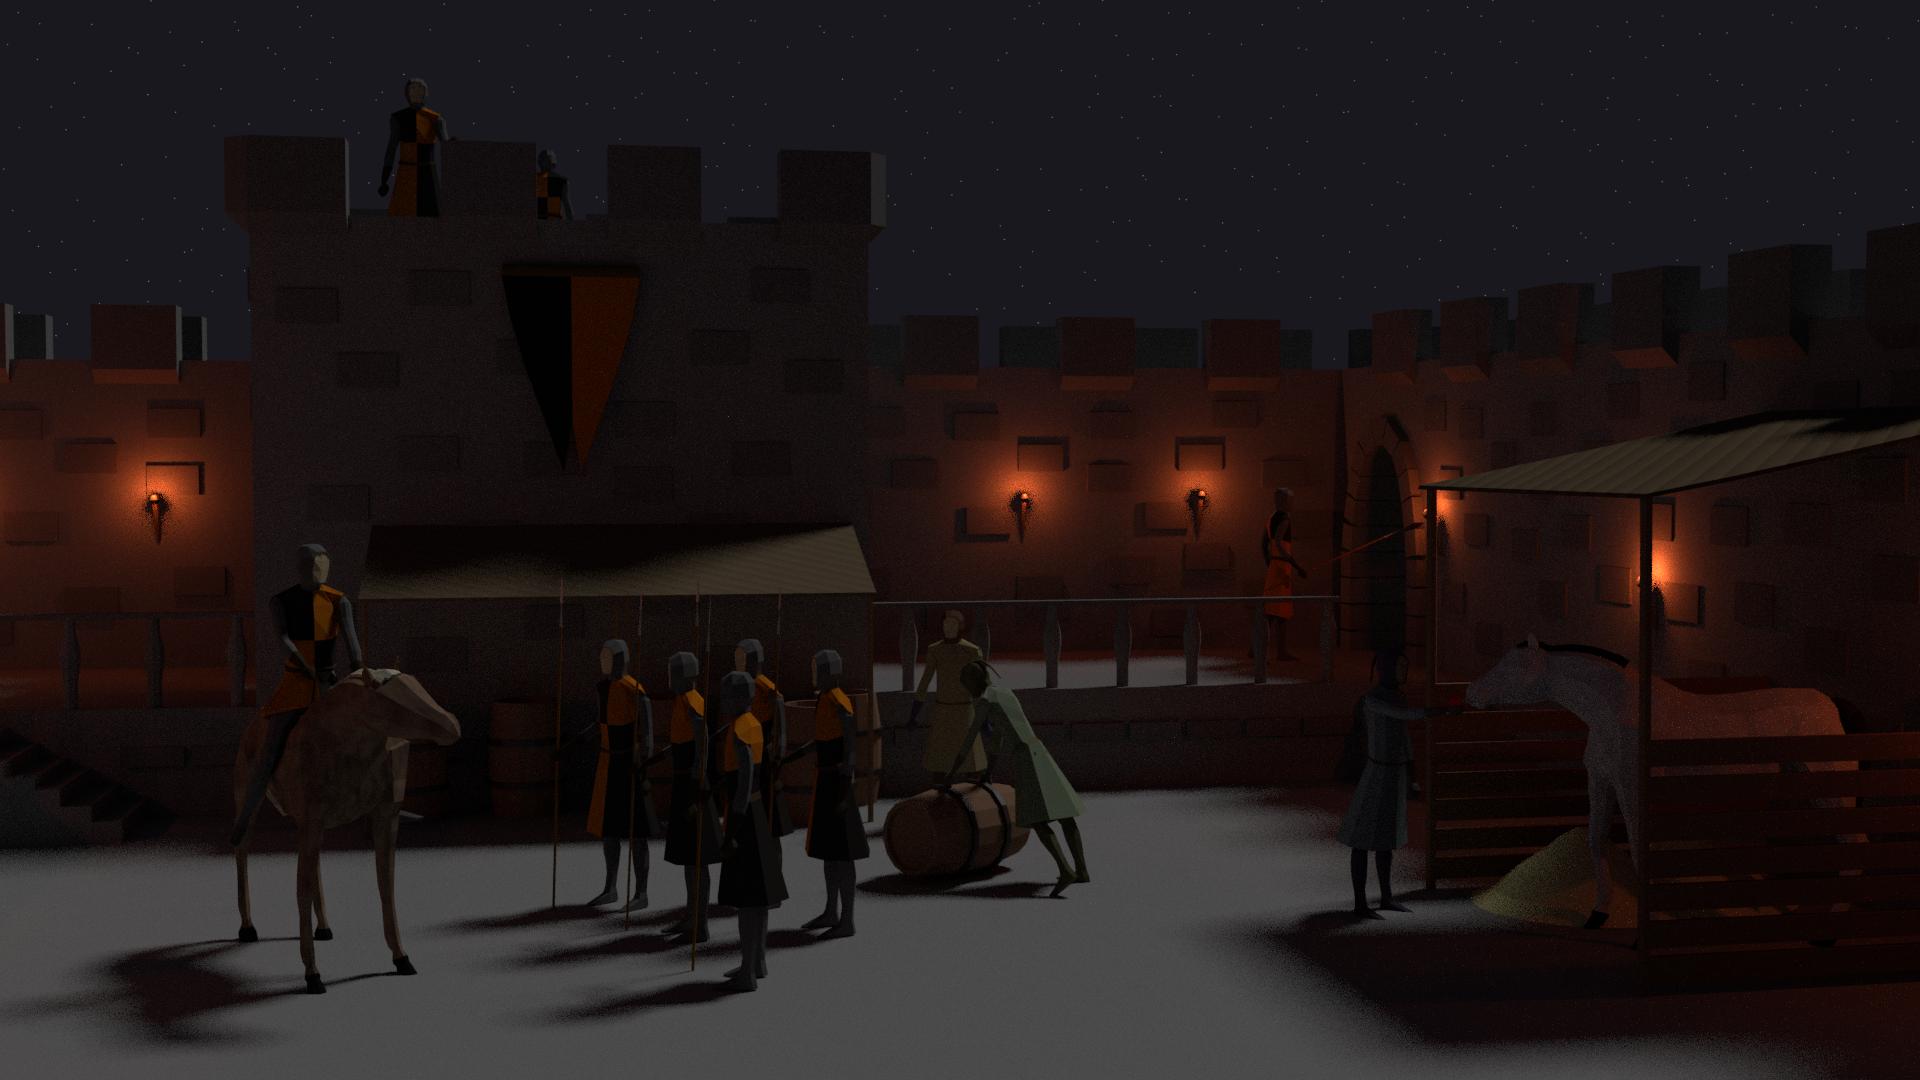 Medieval Environment Rendered in Blender